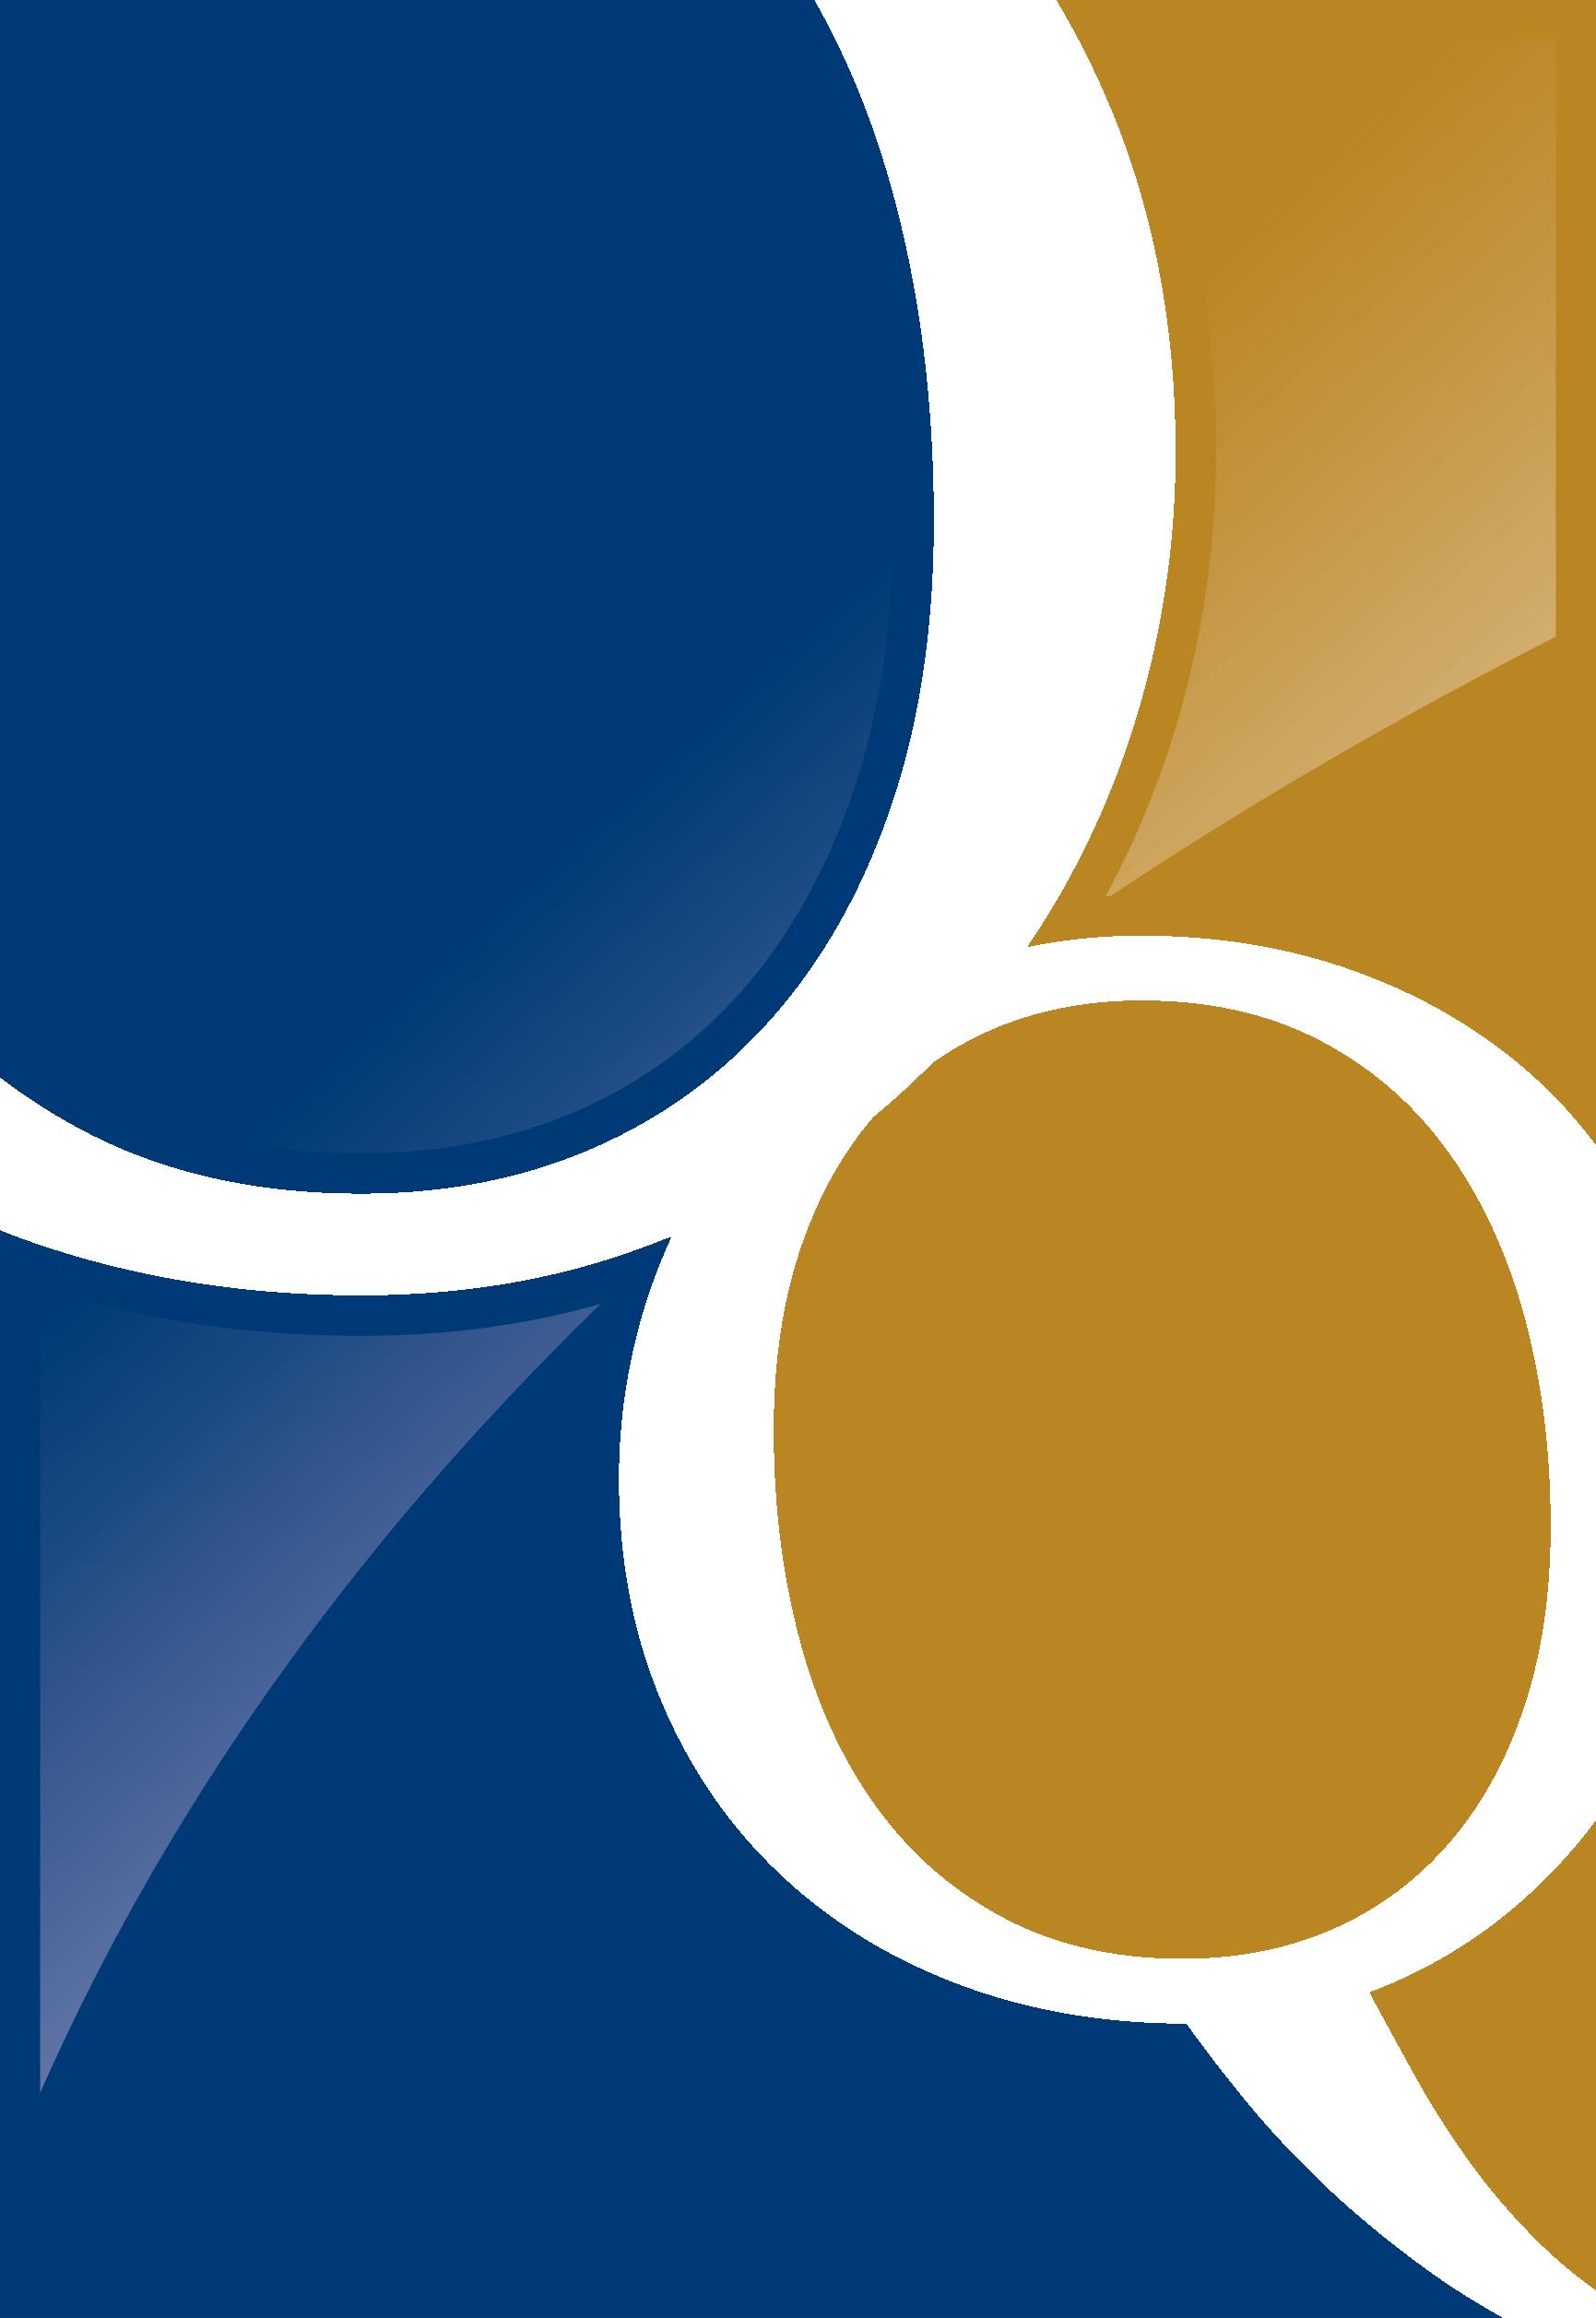 Sophisticated/Bold logo needed for a new Quartz company!